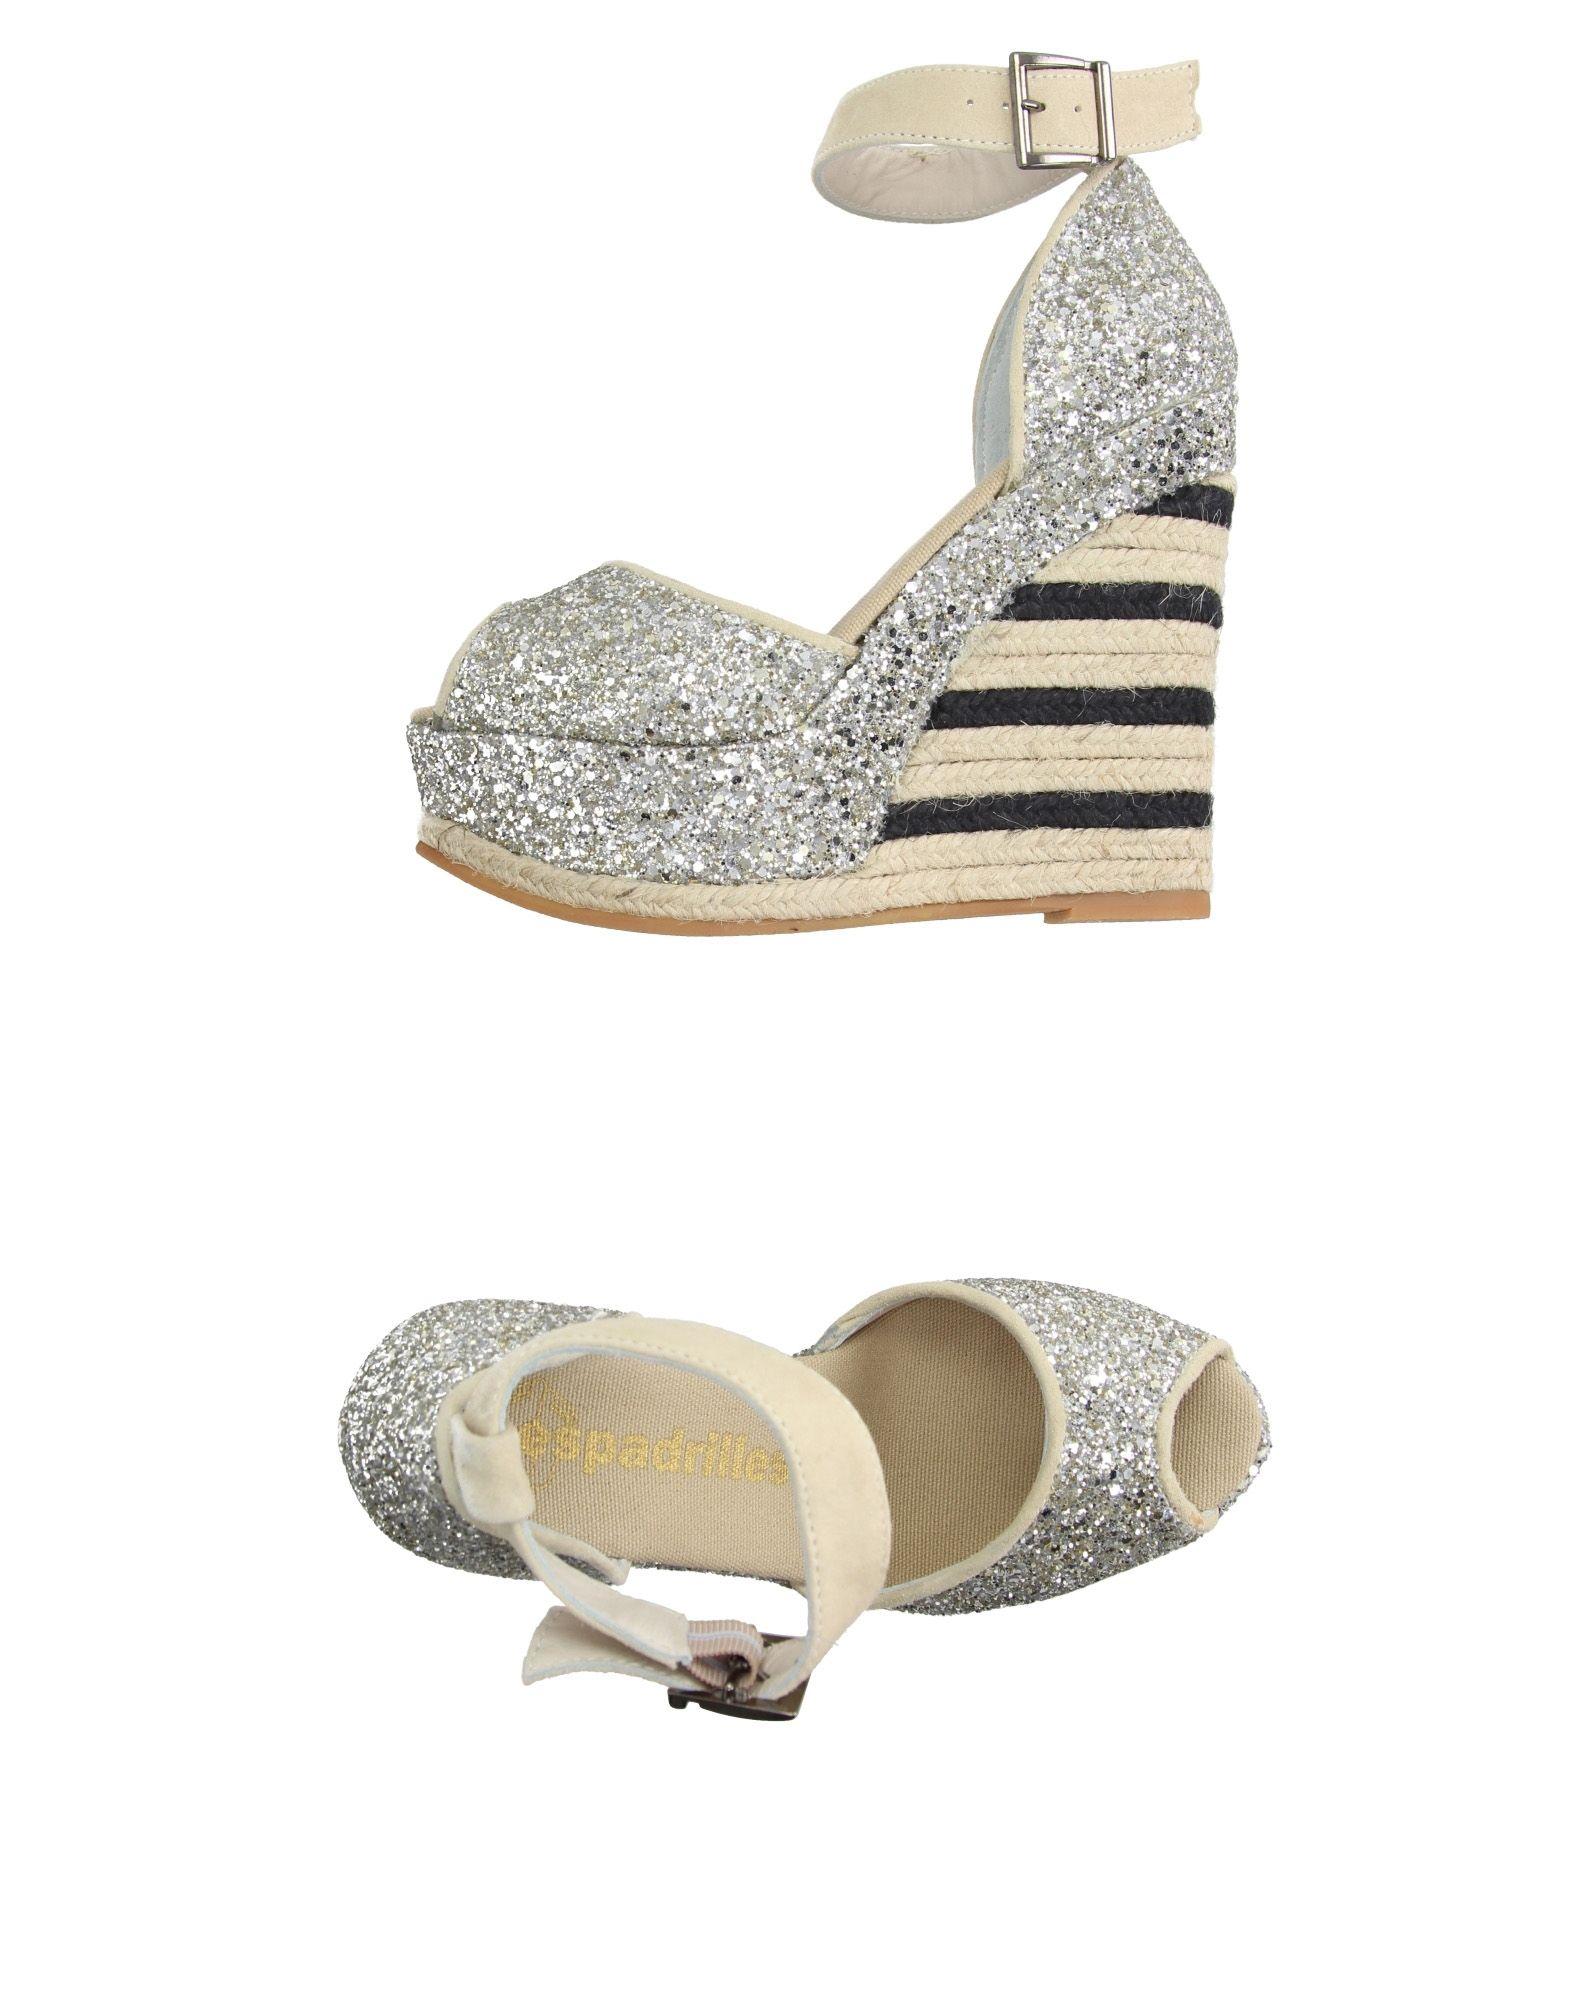 Espadrilles Espadrilles Damen  11140092UD Gute Qualität beliebte Schuhe